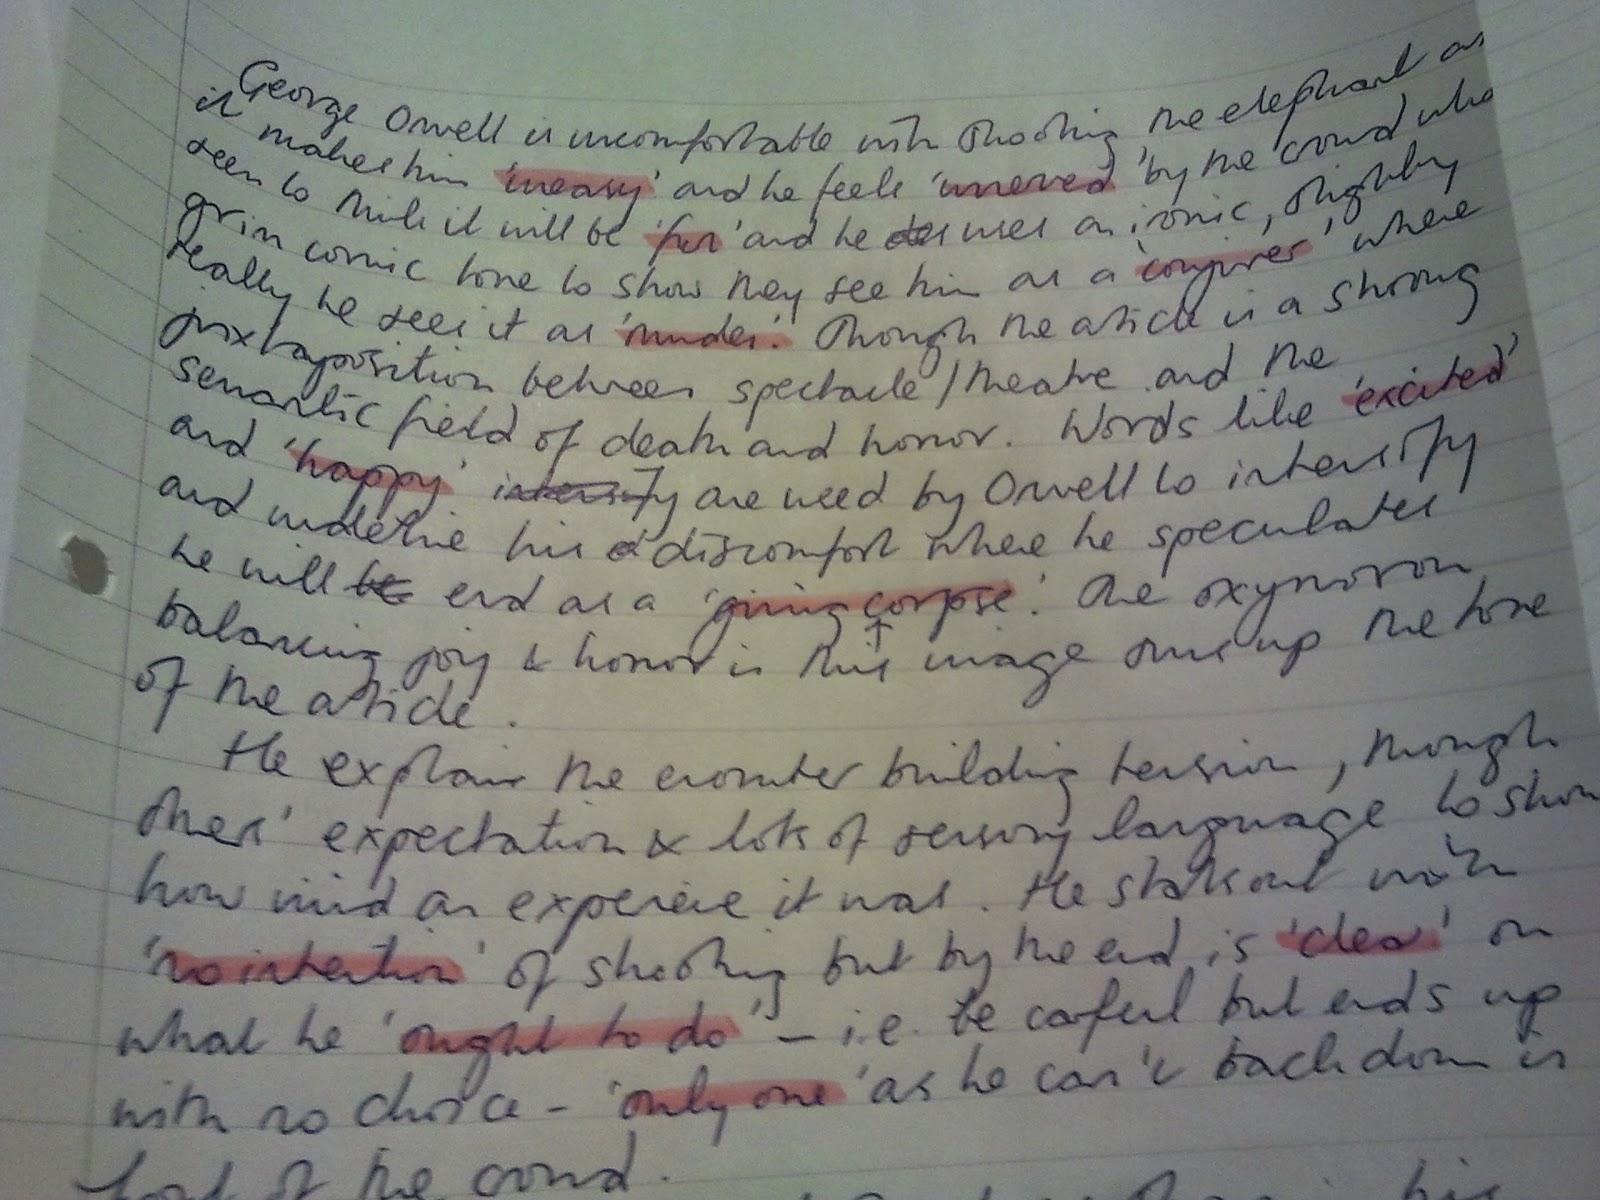 gcse essay igcse gcse essay writing guide on j b priestley s an  curvelearn com checklist words to use in an essay checklist words to use in an essay